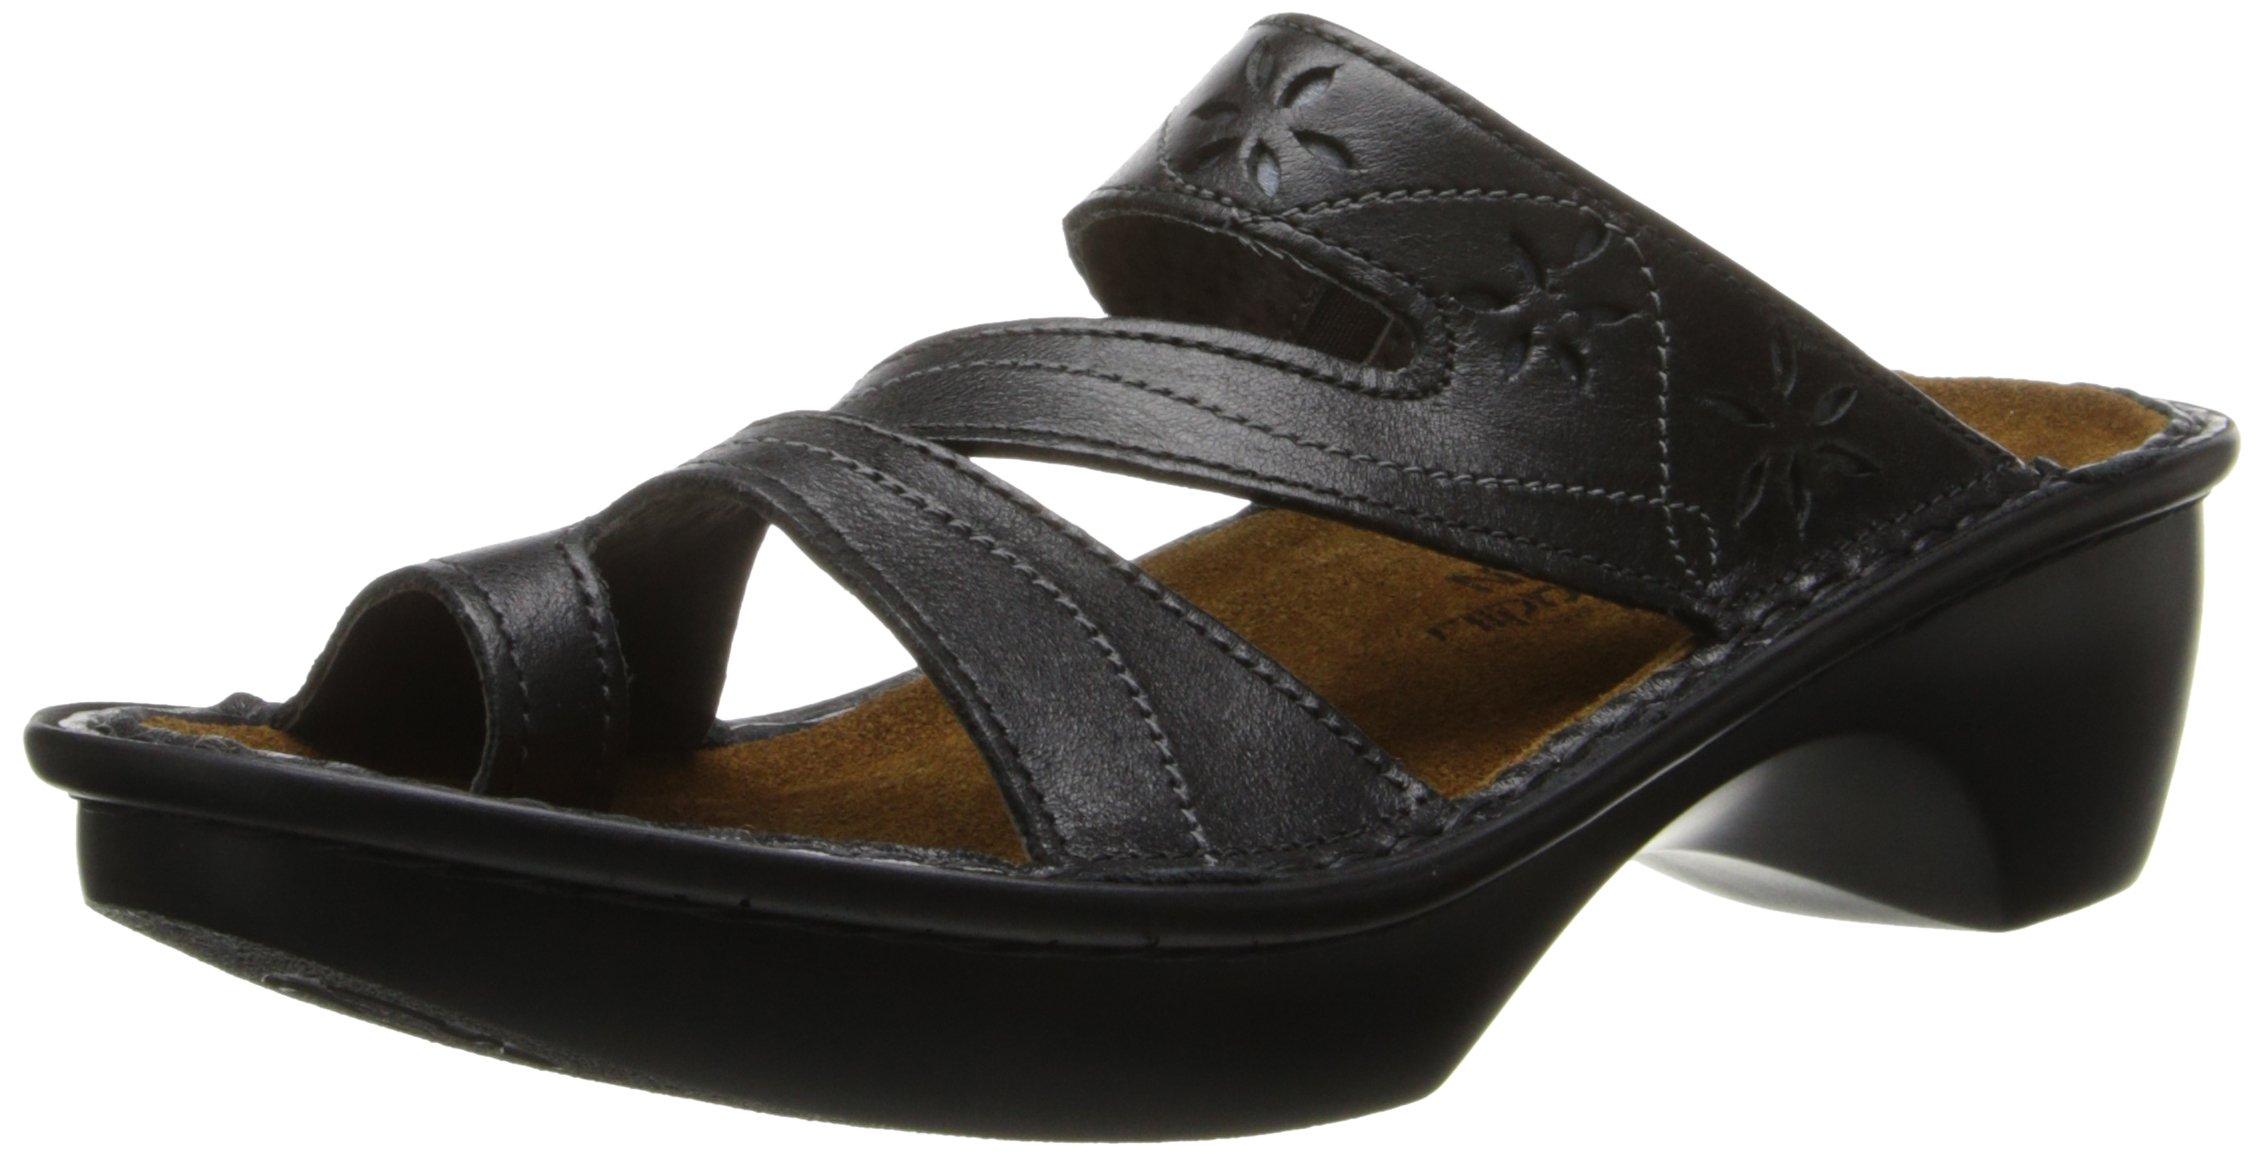 Naot Women's Montreal Wedge Sandal, Midnight Black Leather, 39 EU/7.5-8 M US